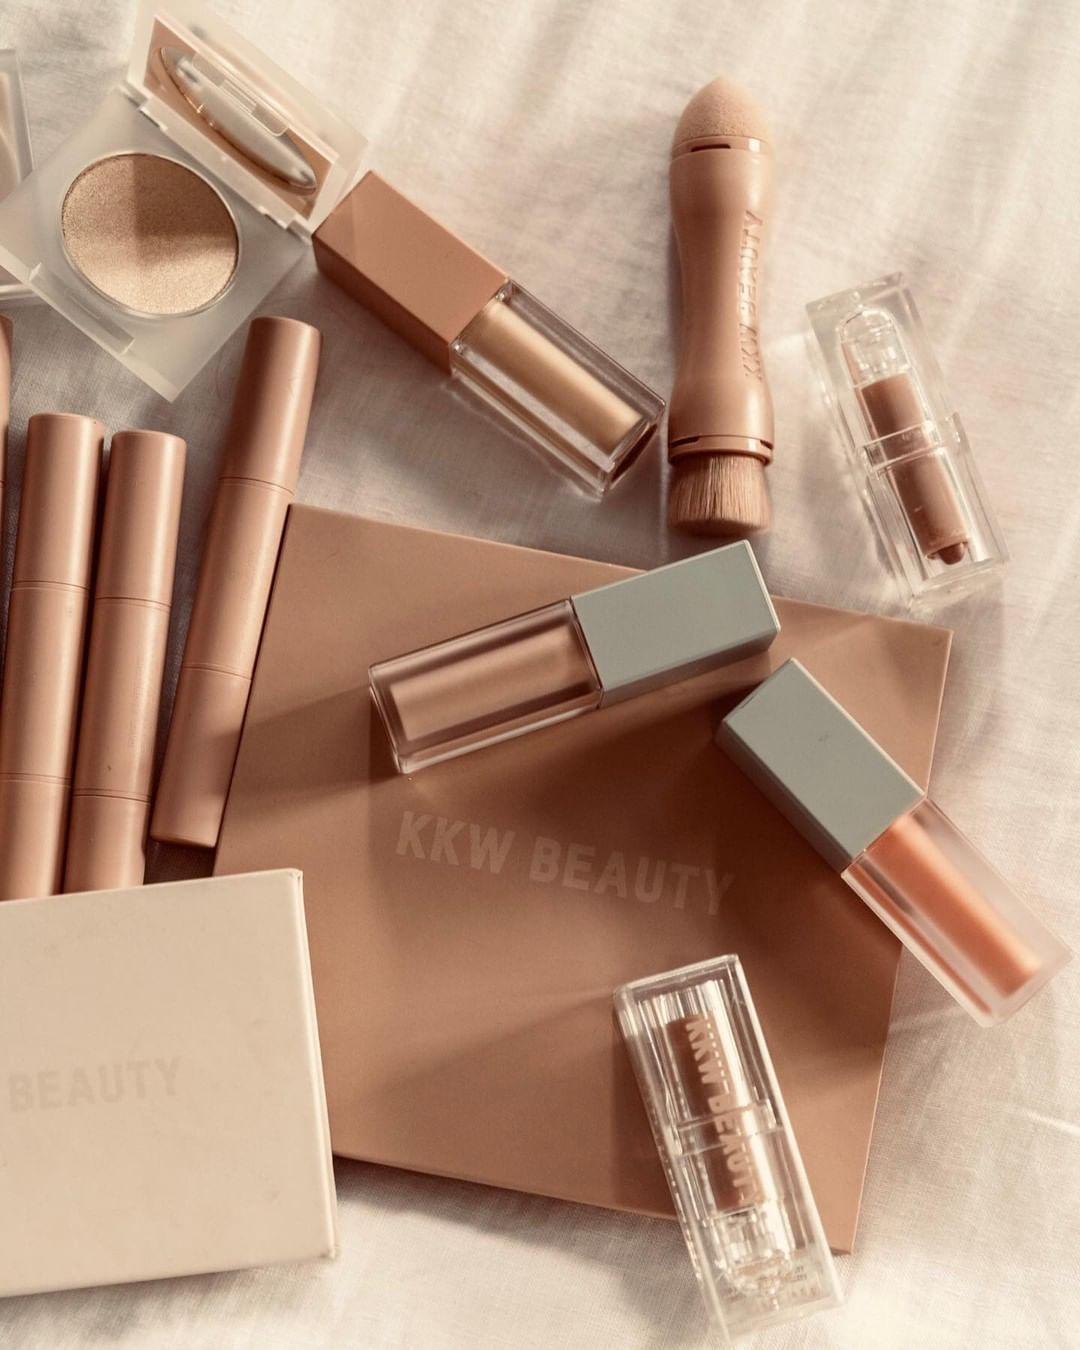 Ulta Beauty : Save 75% on select Kim Kardashian West Beauty Cosmetics